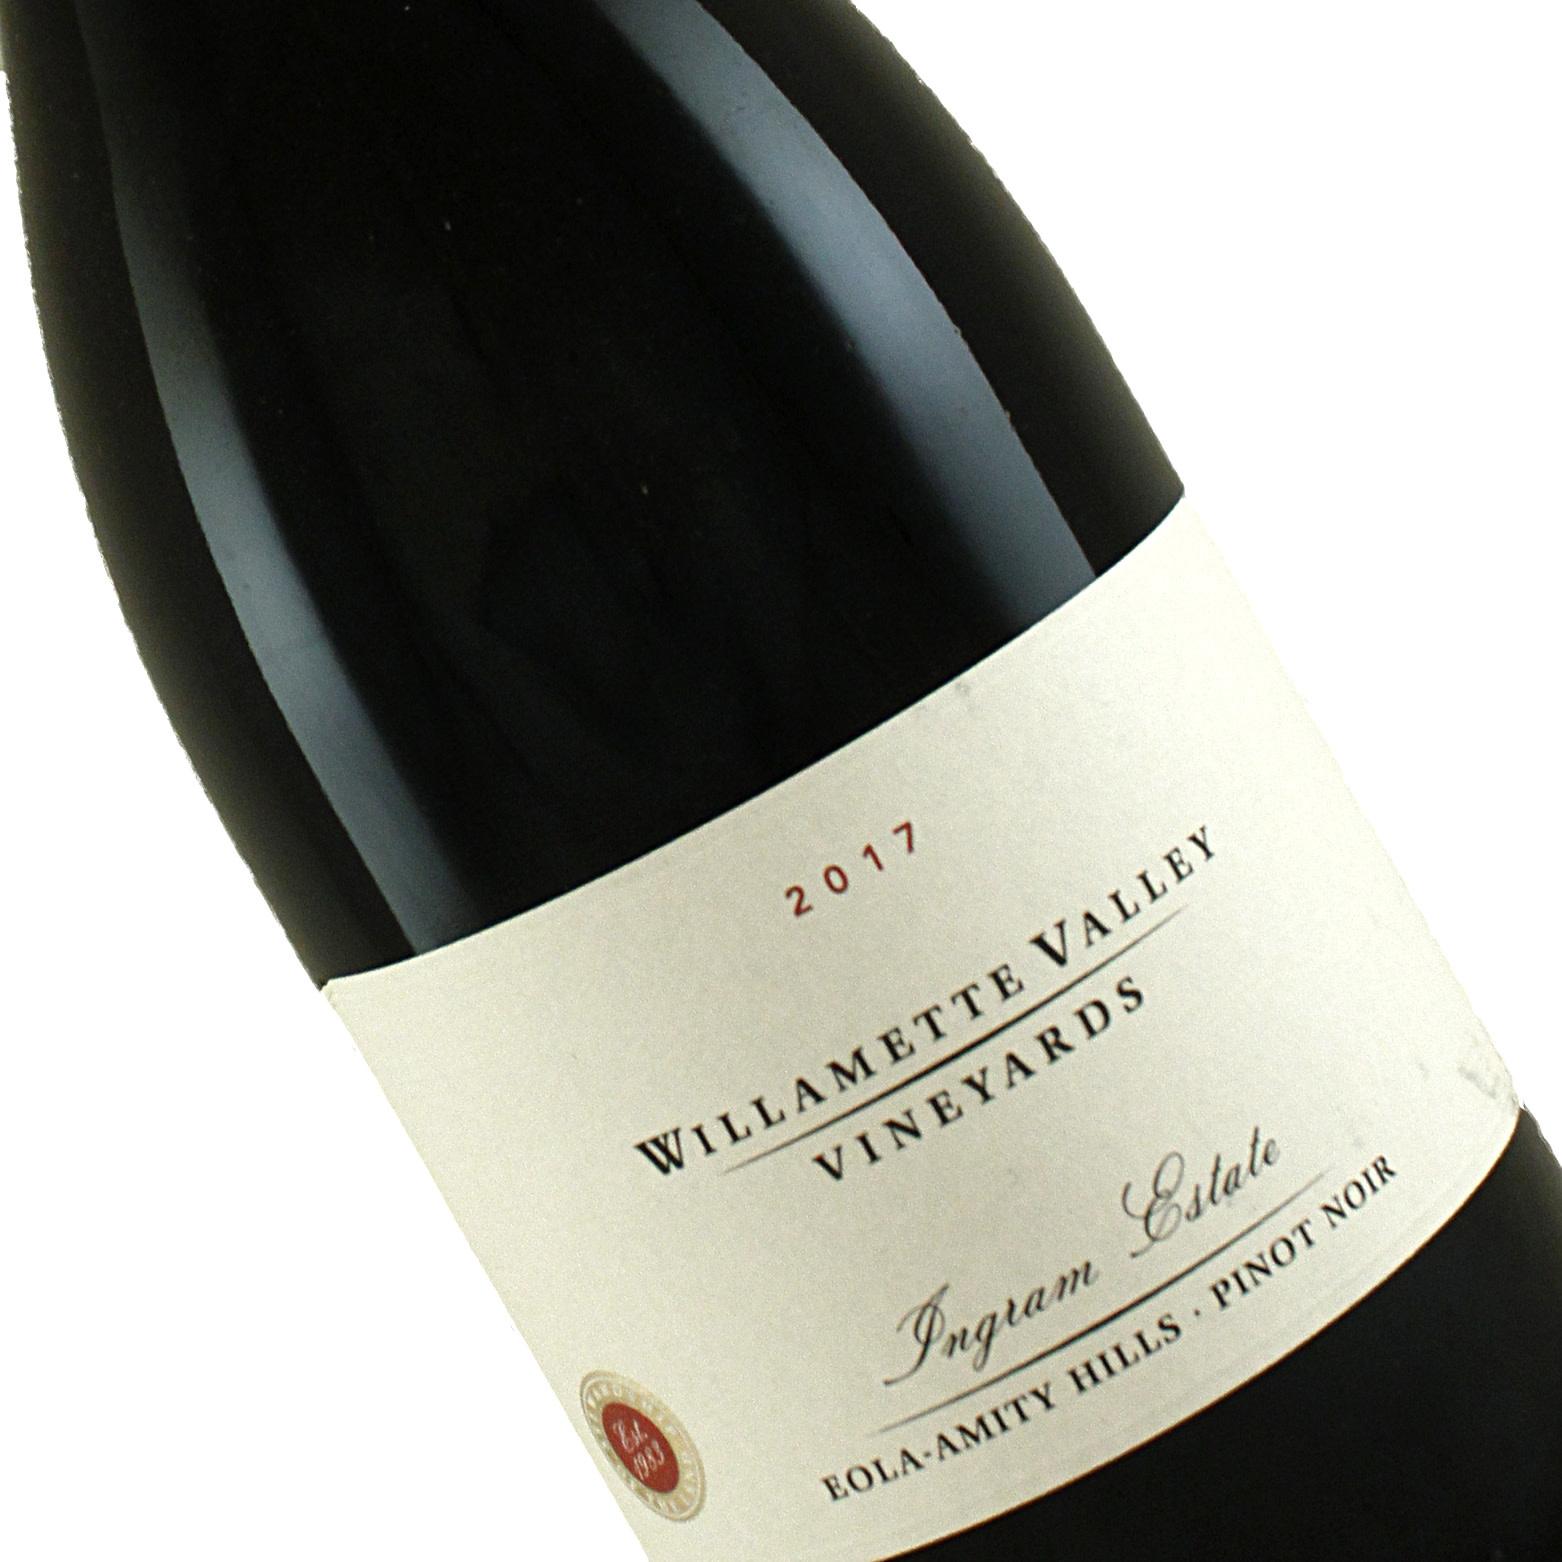 Willamette Valley Vineyards 2017 Ingram Estate Pinot Noir, Eola Amity Hills